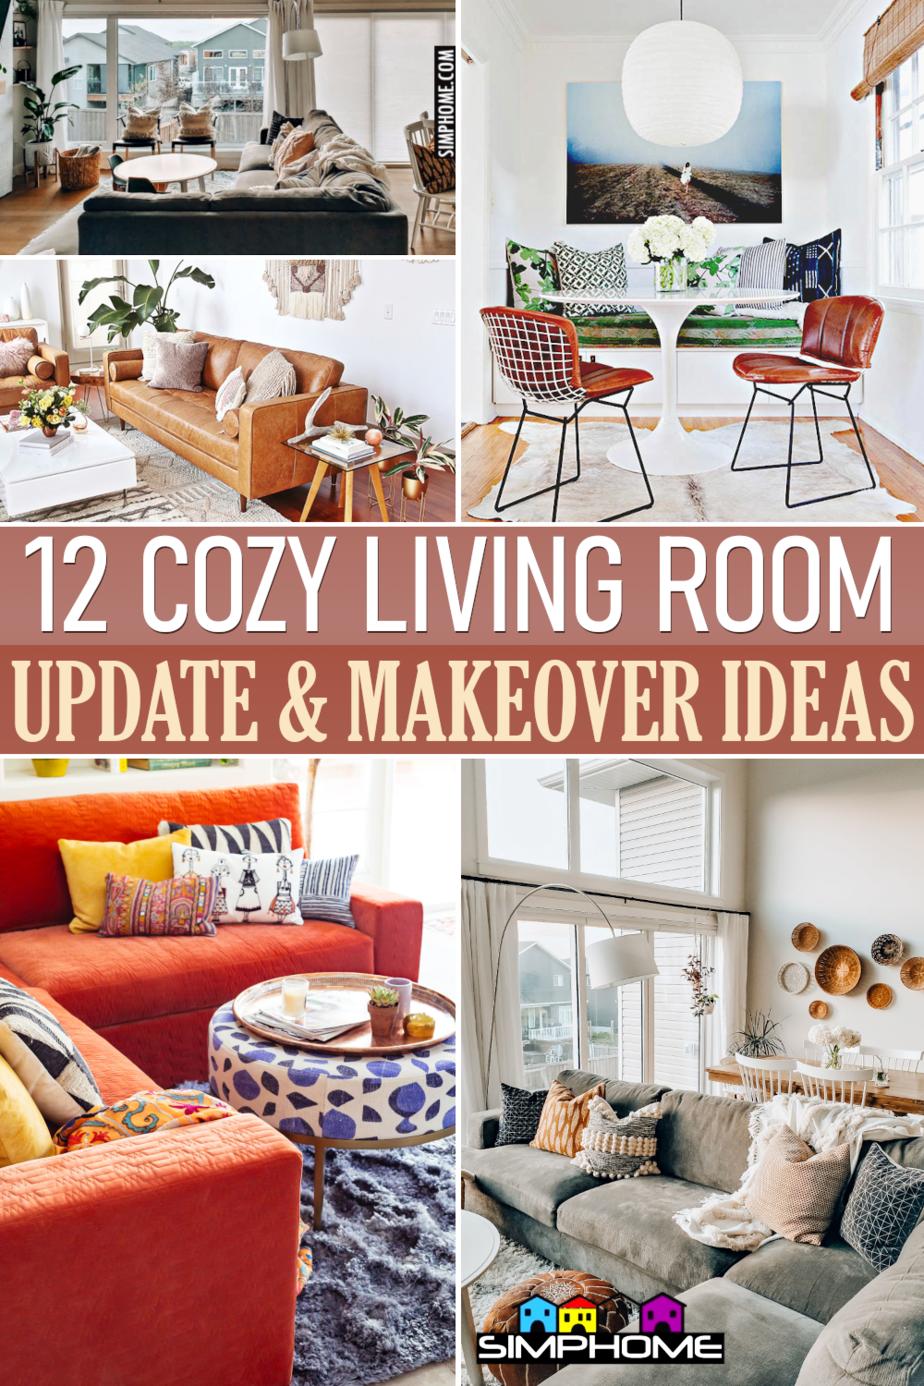 12 cOZY Living room Ideas via Simphome.comFeatured